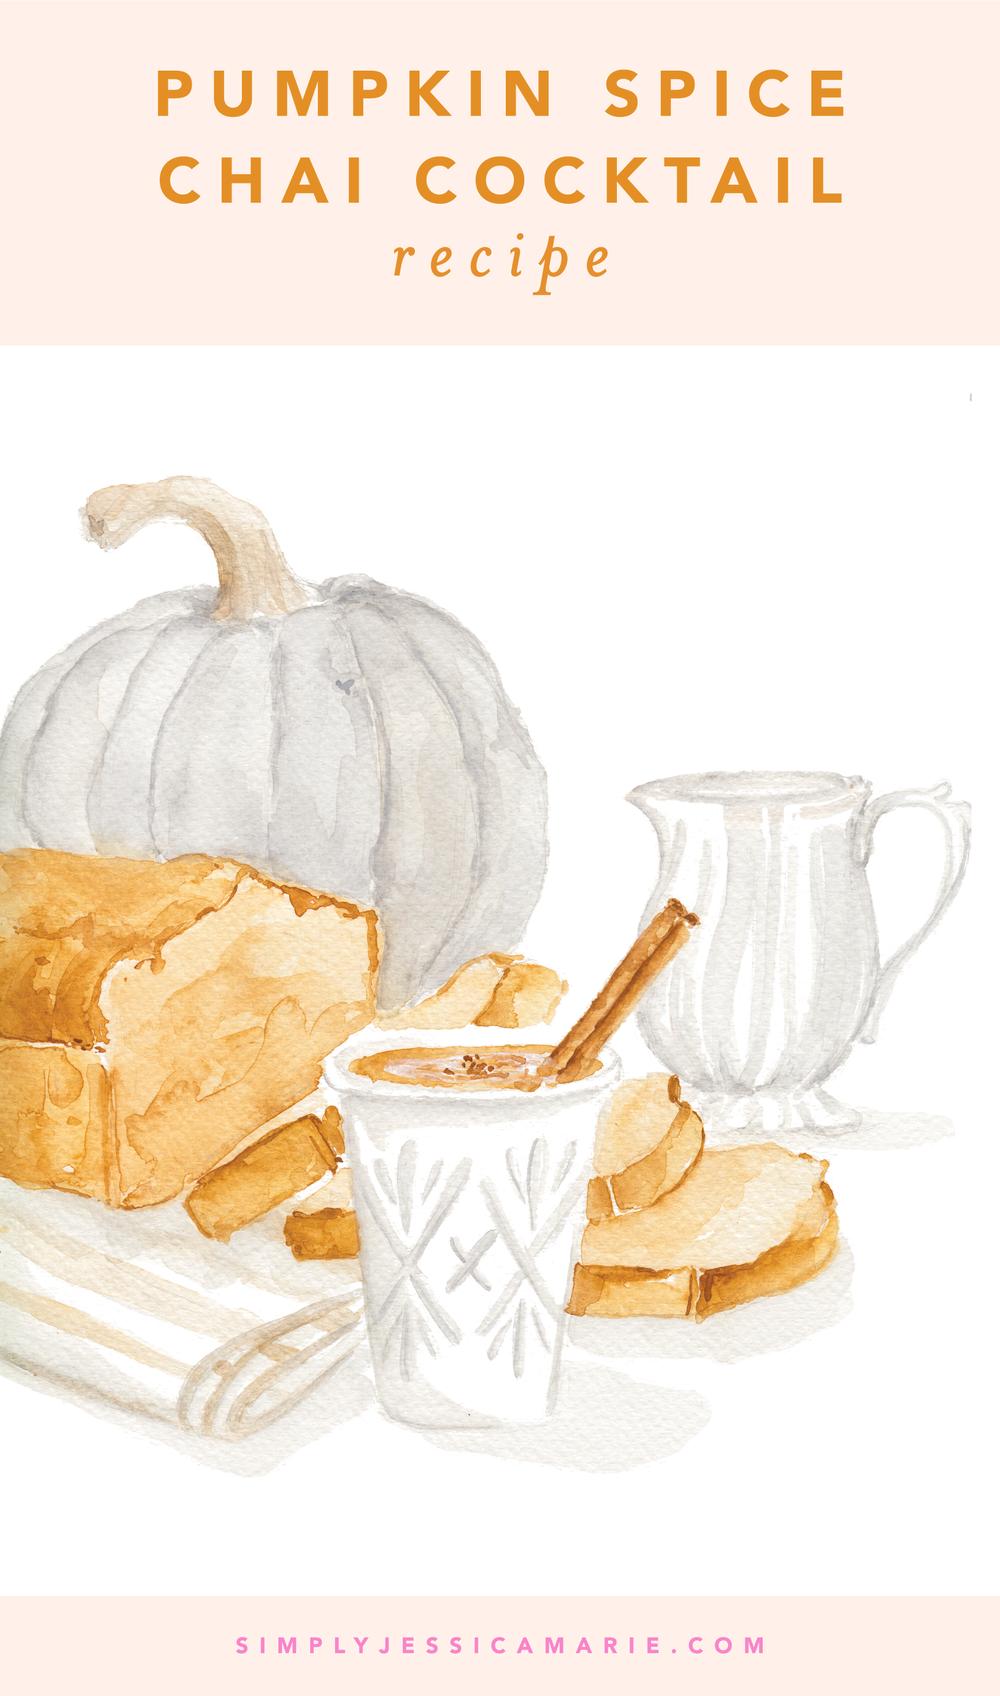 Pumpkin Spice Chai Latte Cocktail Recipe by Simply Jessica Marie